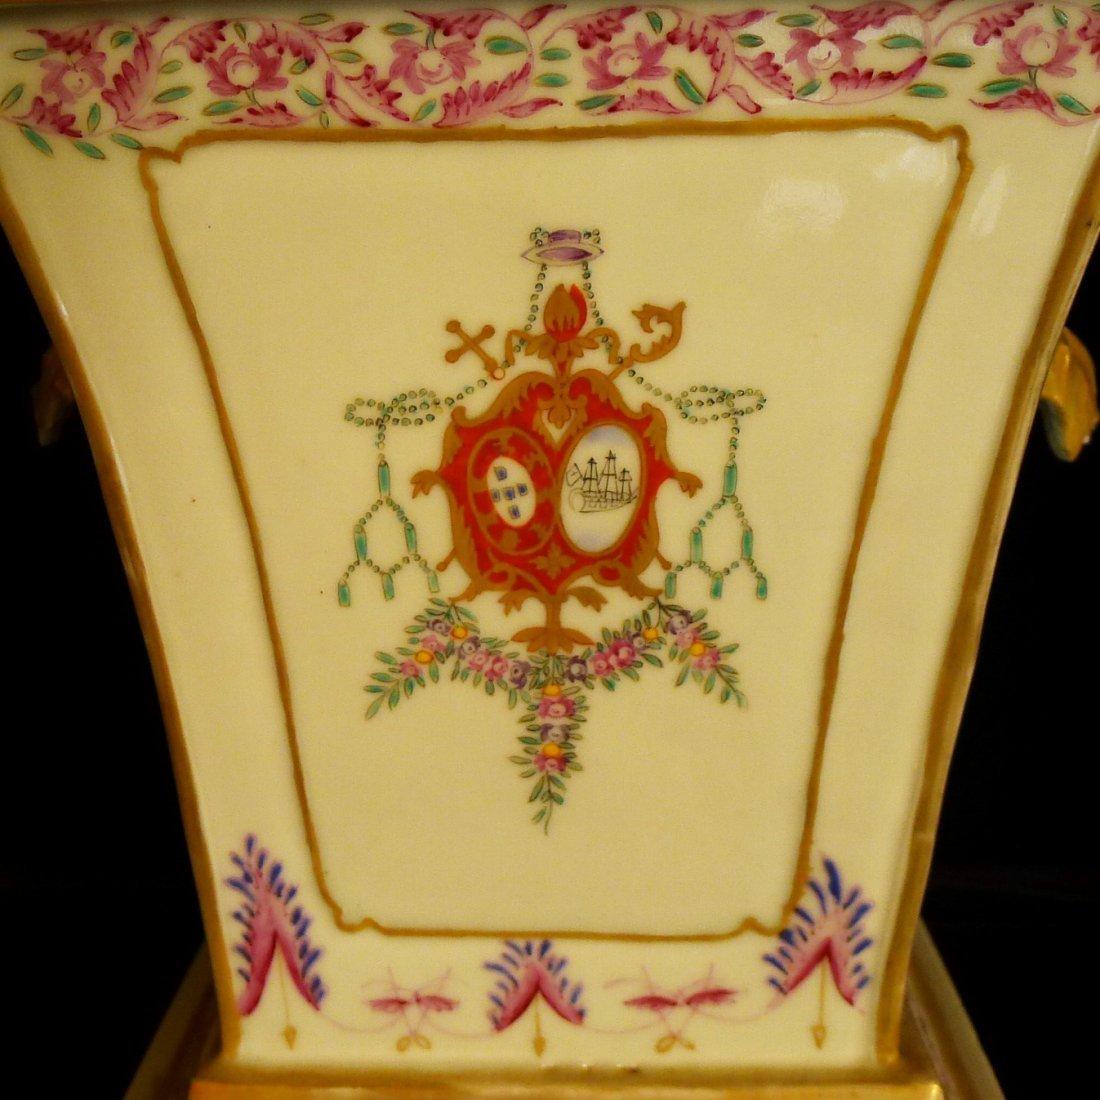 Prar of Chinese export porcelain European heraldry - 5